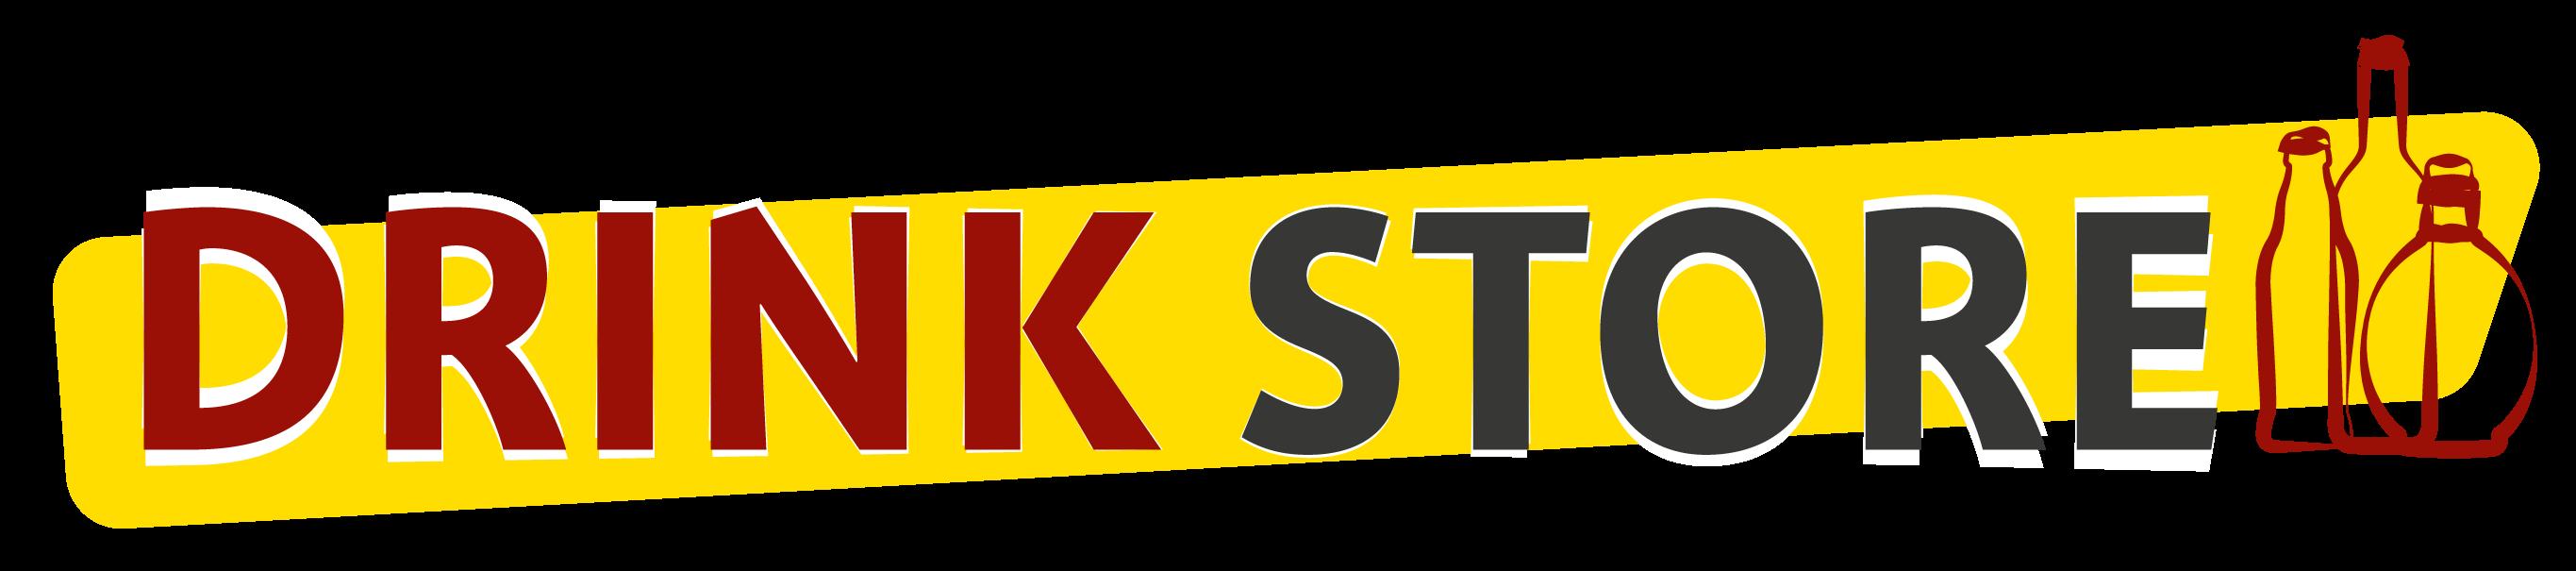 DrinkStore-Logo_A-01